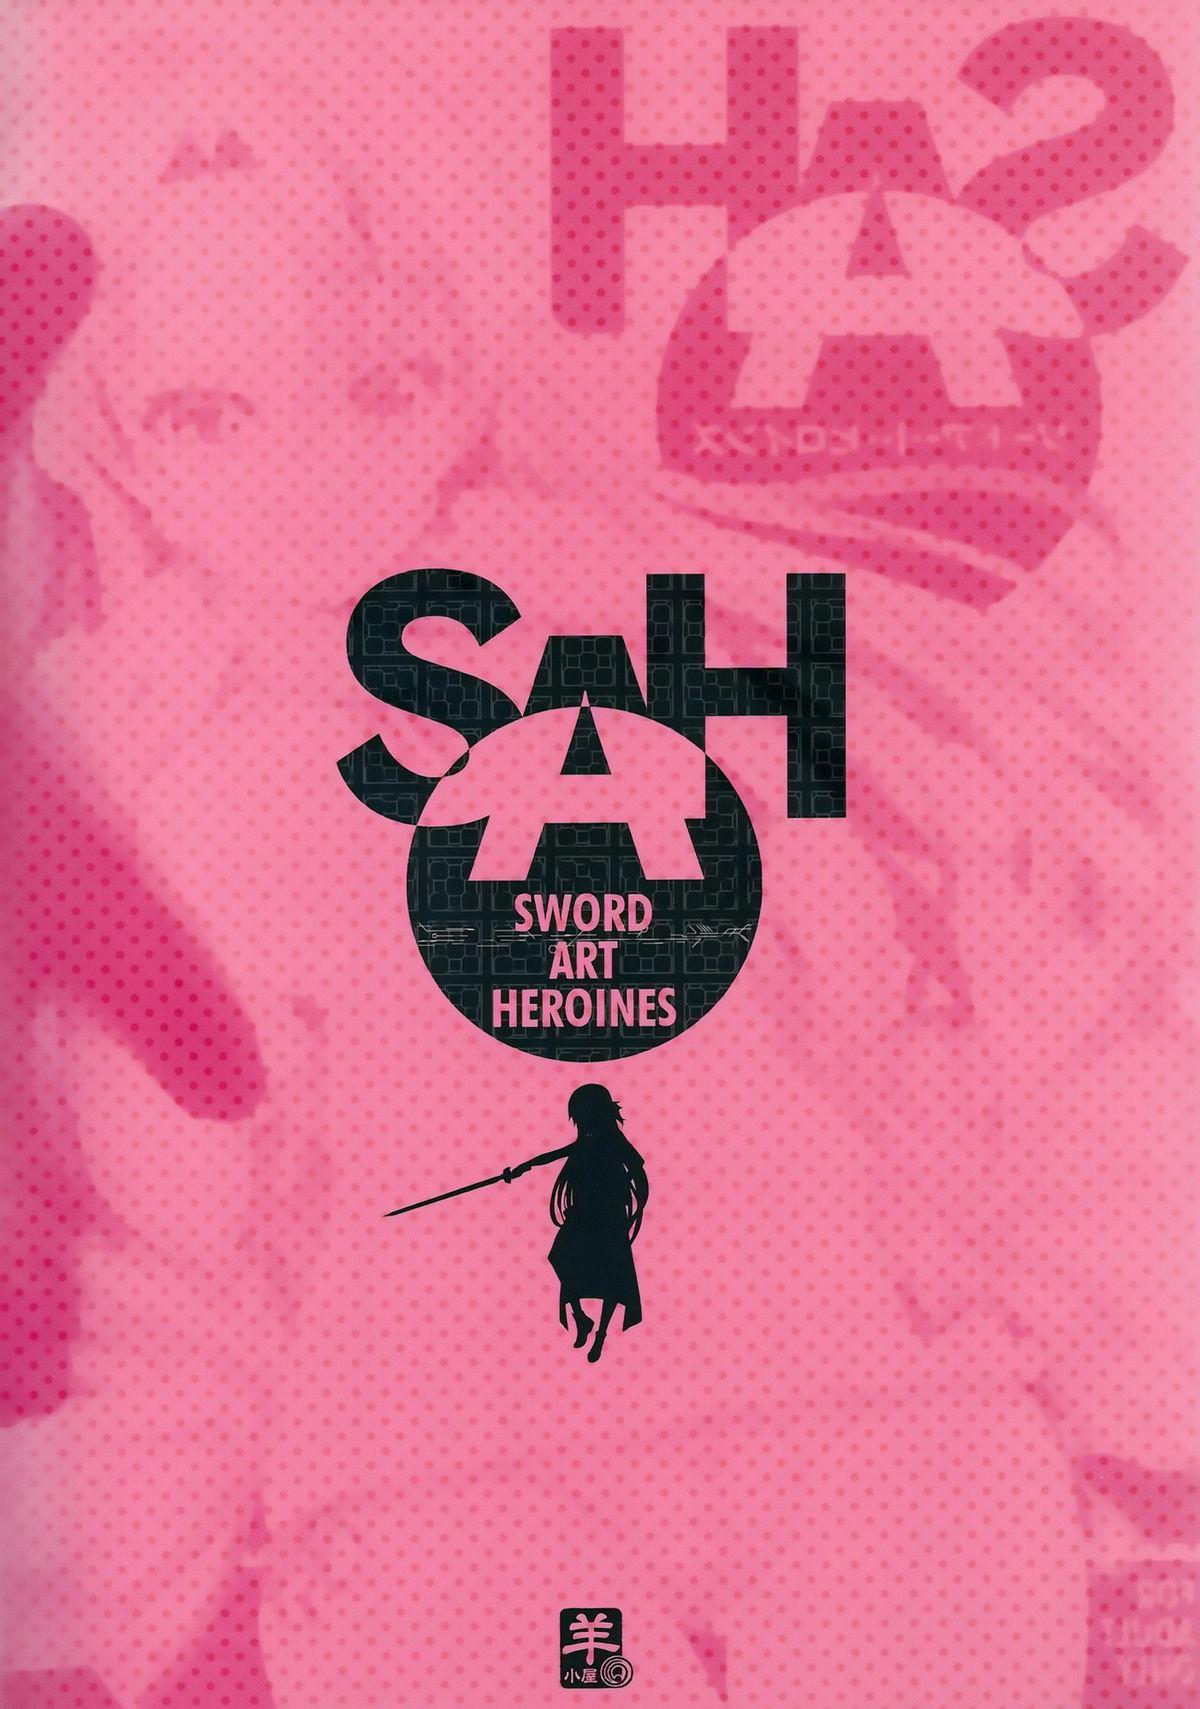 Sword Art Heroines 1